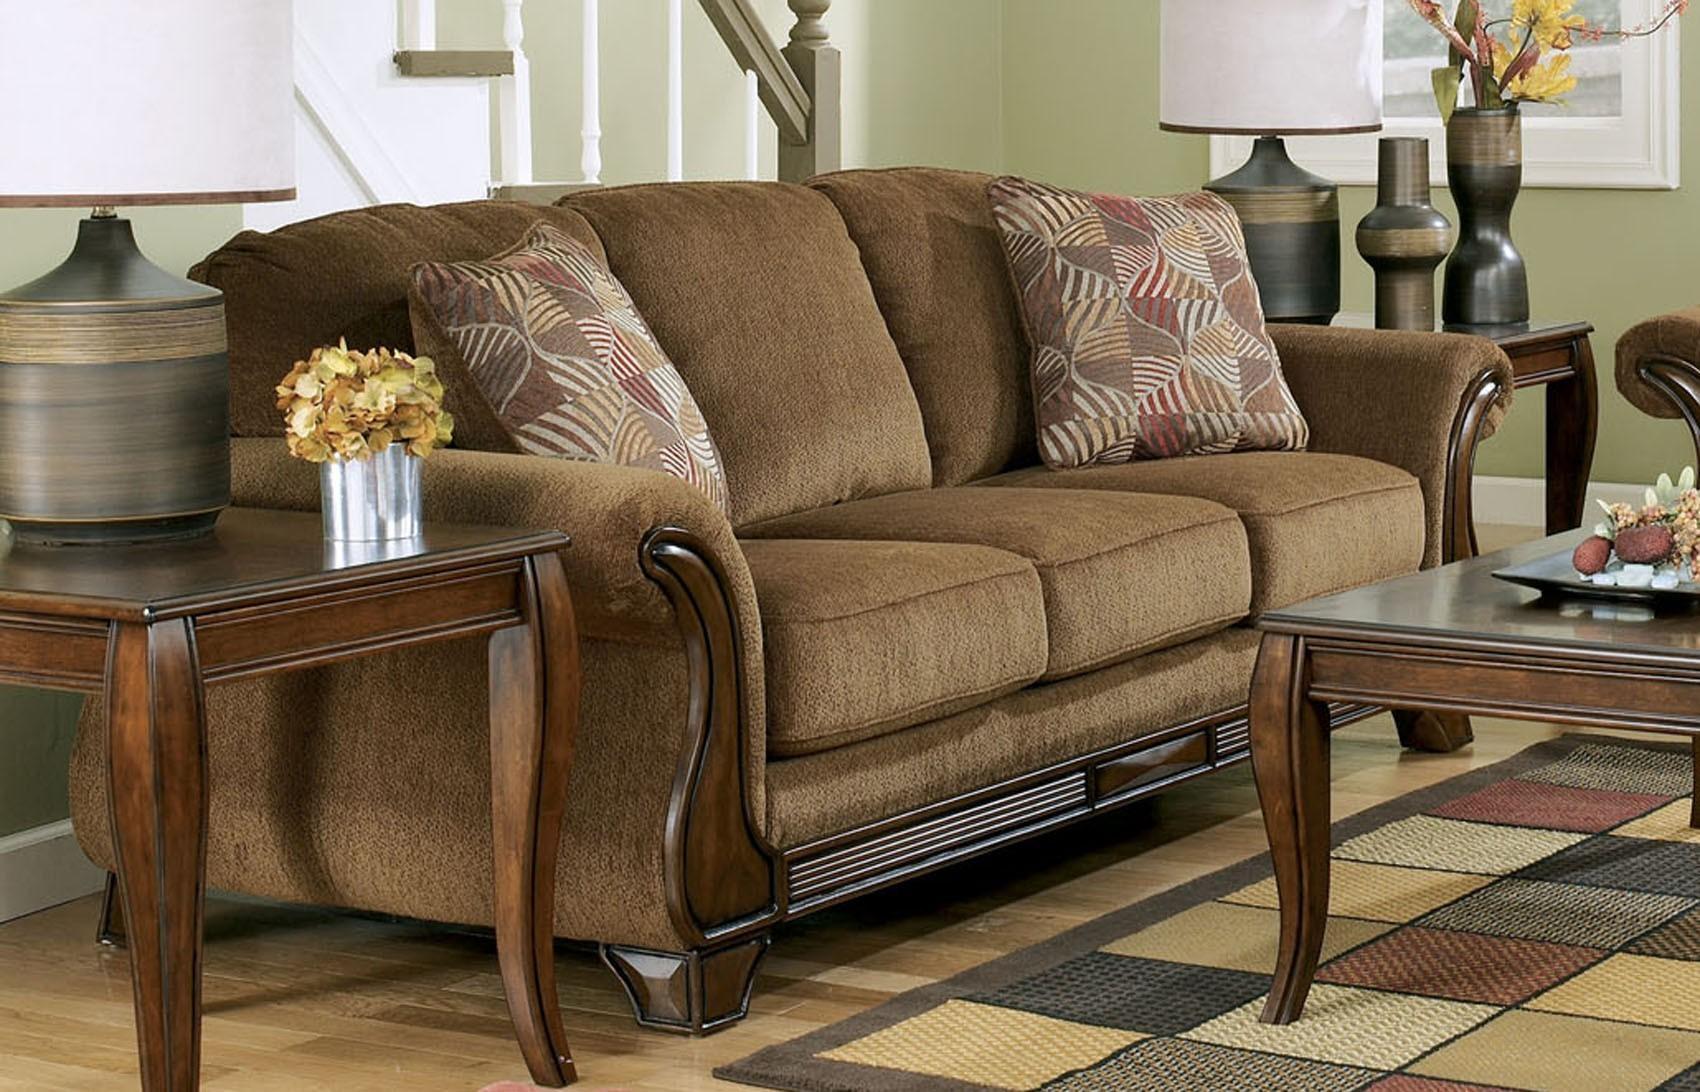 Sofas Center : Ashley Furniture Recliner Sofas Microfibert Pertaining To Ashley Furniture Corduroy Sectional Sofas (View 19 of 20)